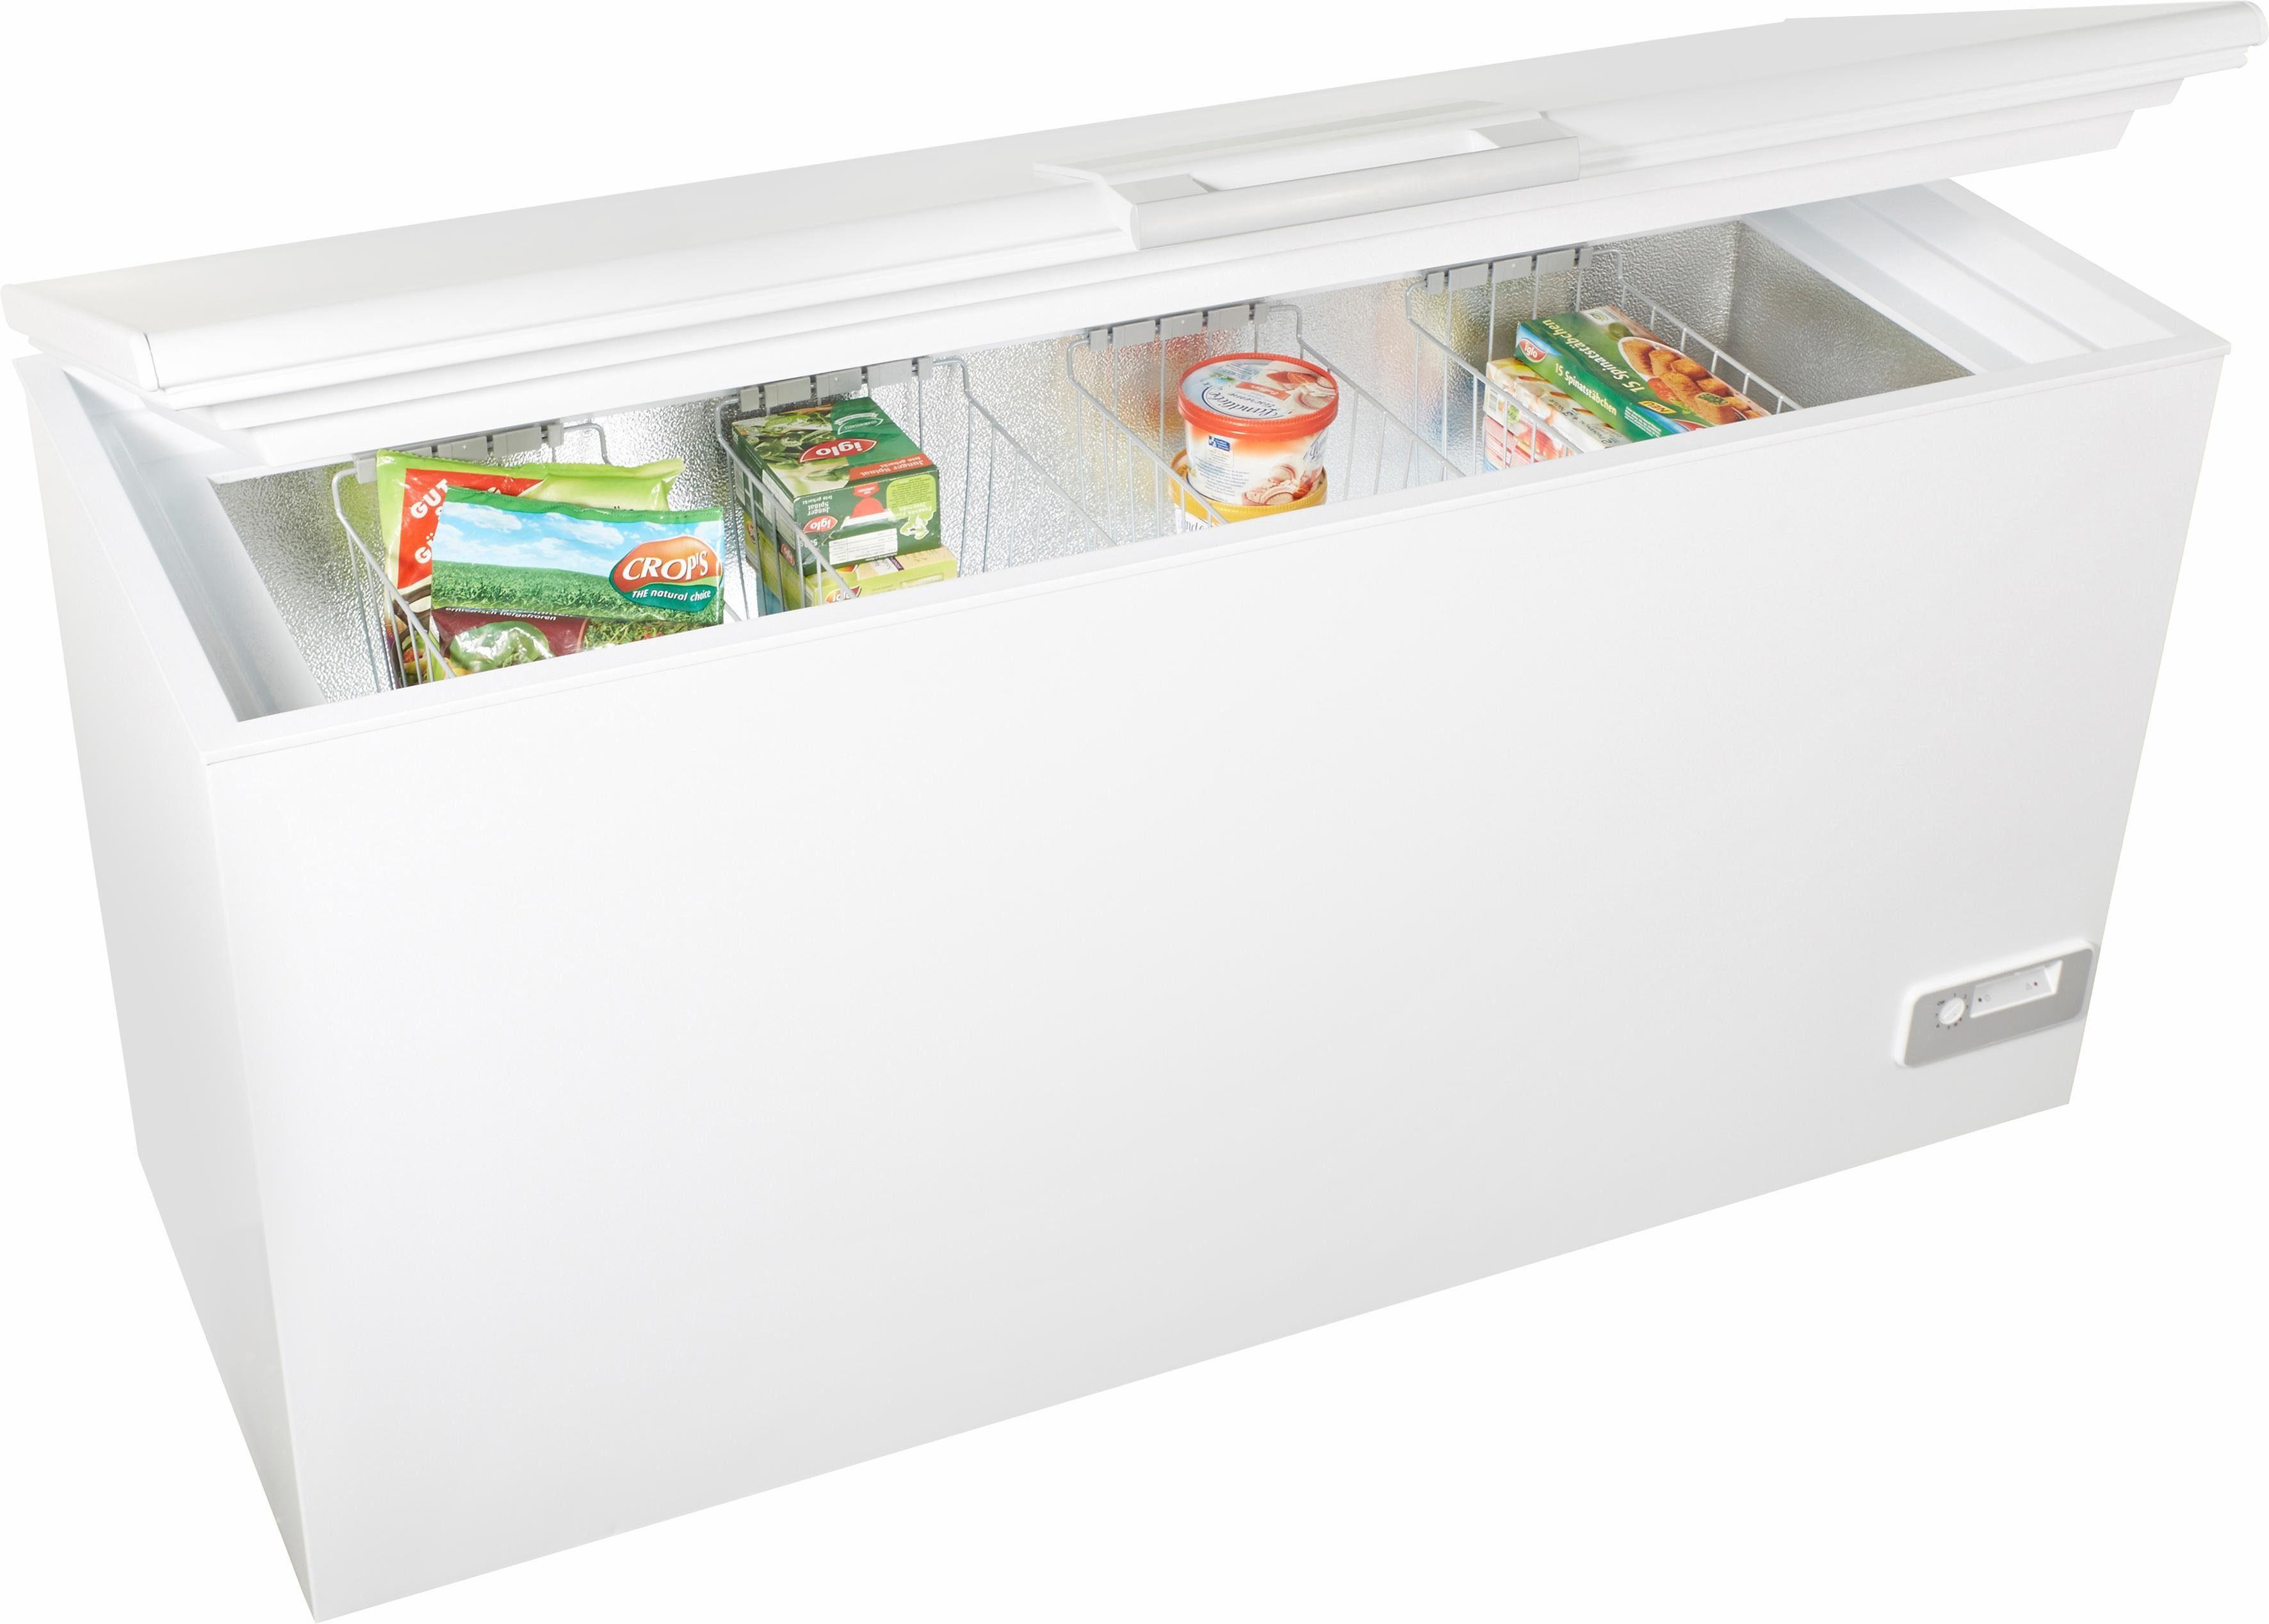 Amica Kühlschrank Inbetriebnahme : Aeg kühlschrank inbetriebnahme kühlschrank temperatur richtig